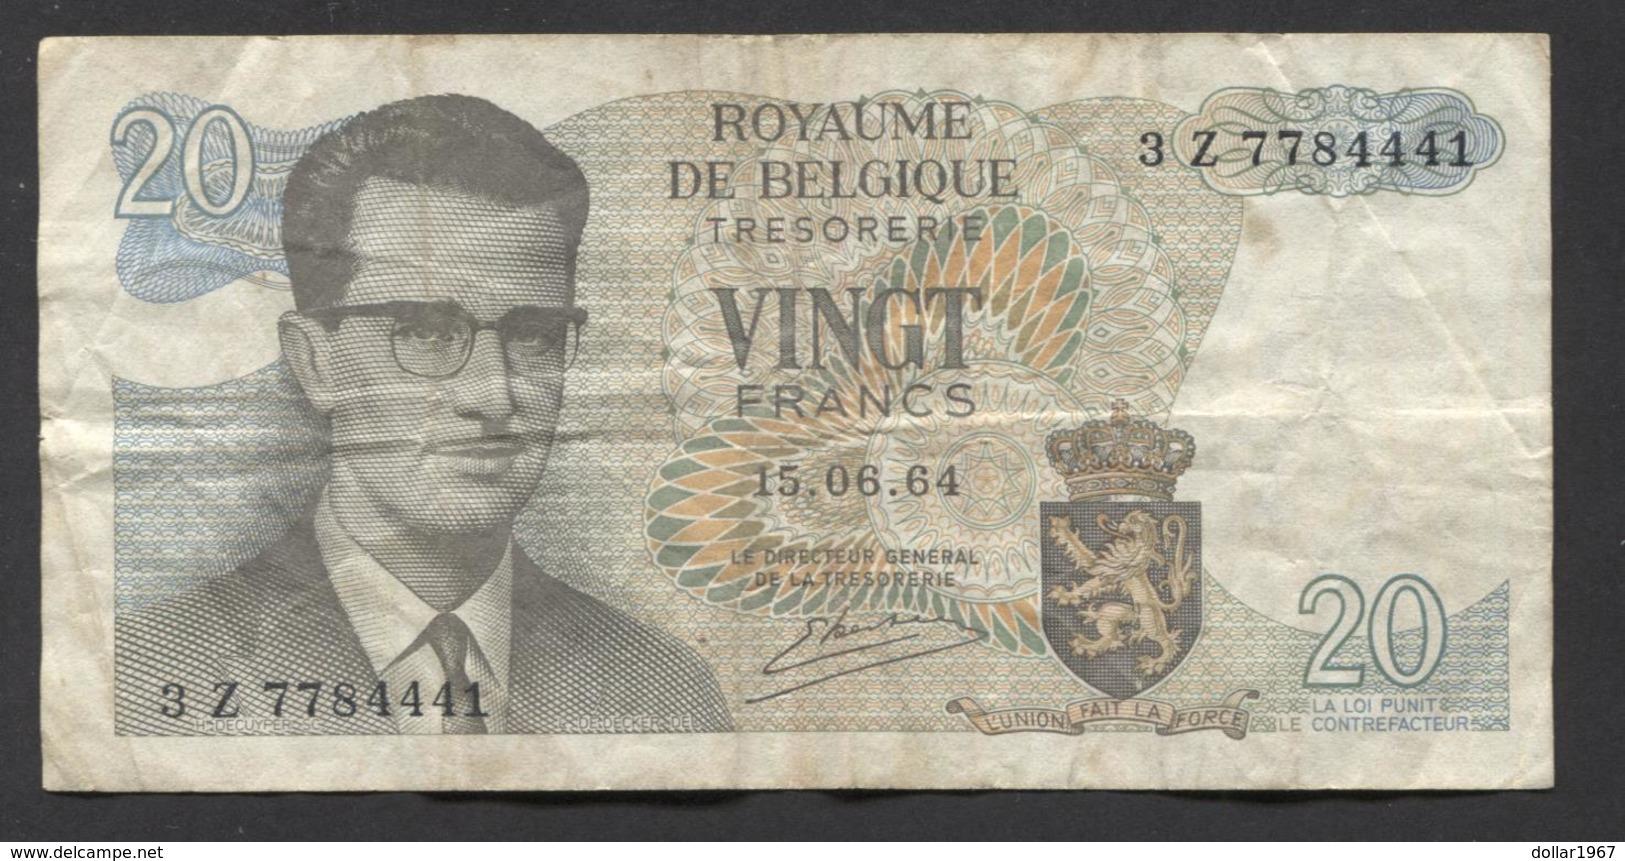 België Belgique Belgium 15 06 1964 -  20 Francs Atomium Baudouin. 3 Z  7784441 - [ 6] Treasury